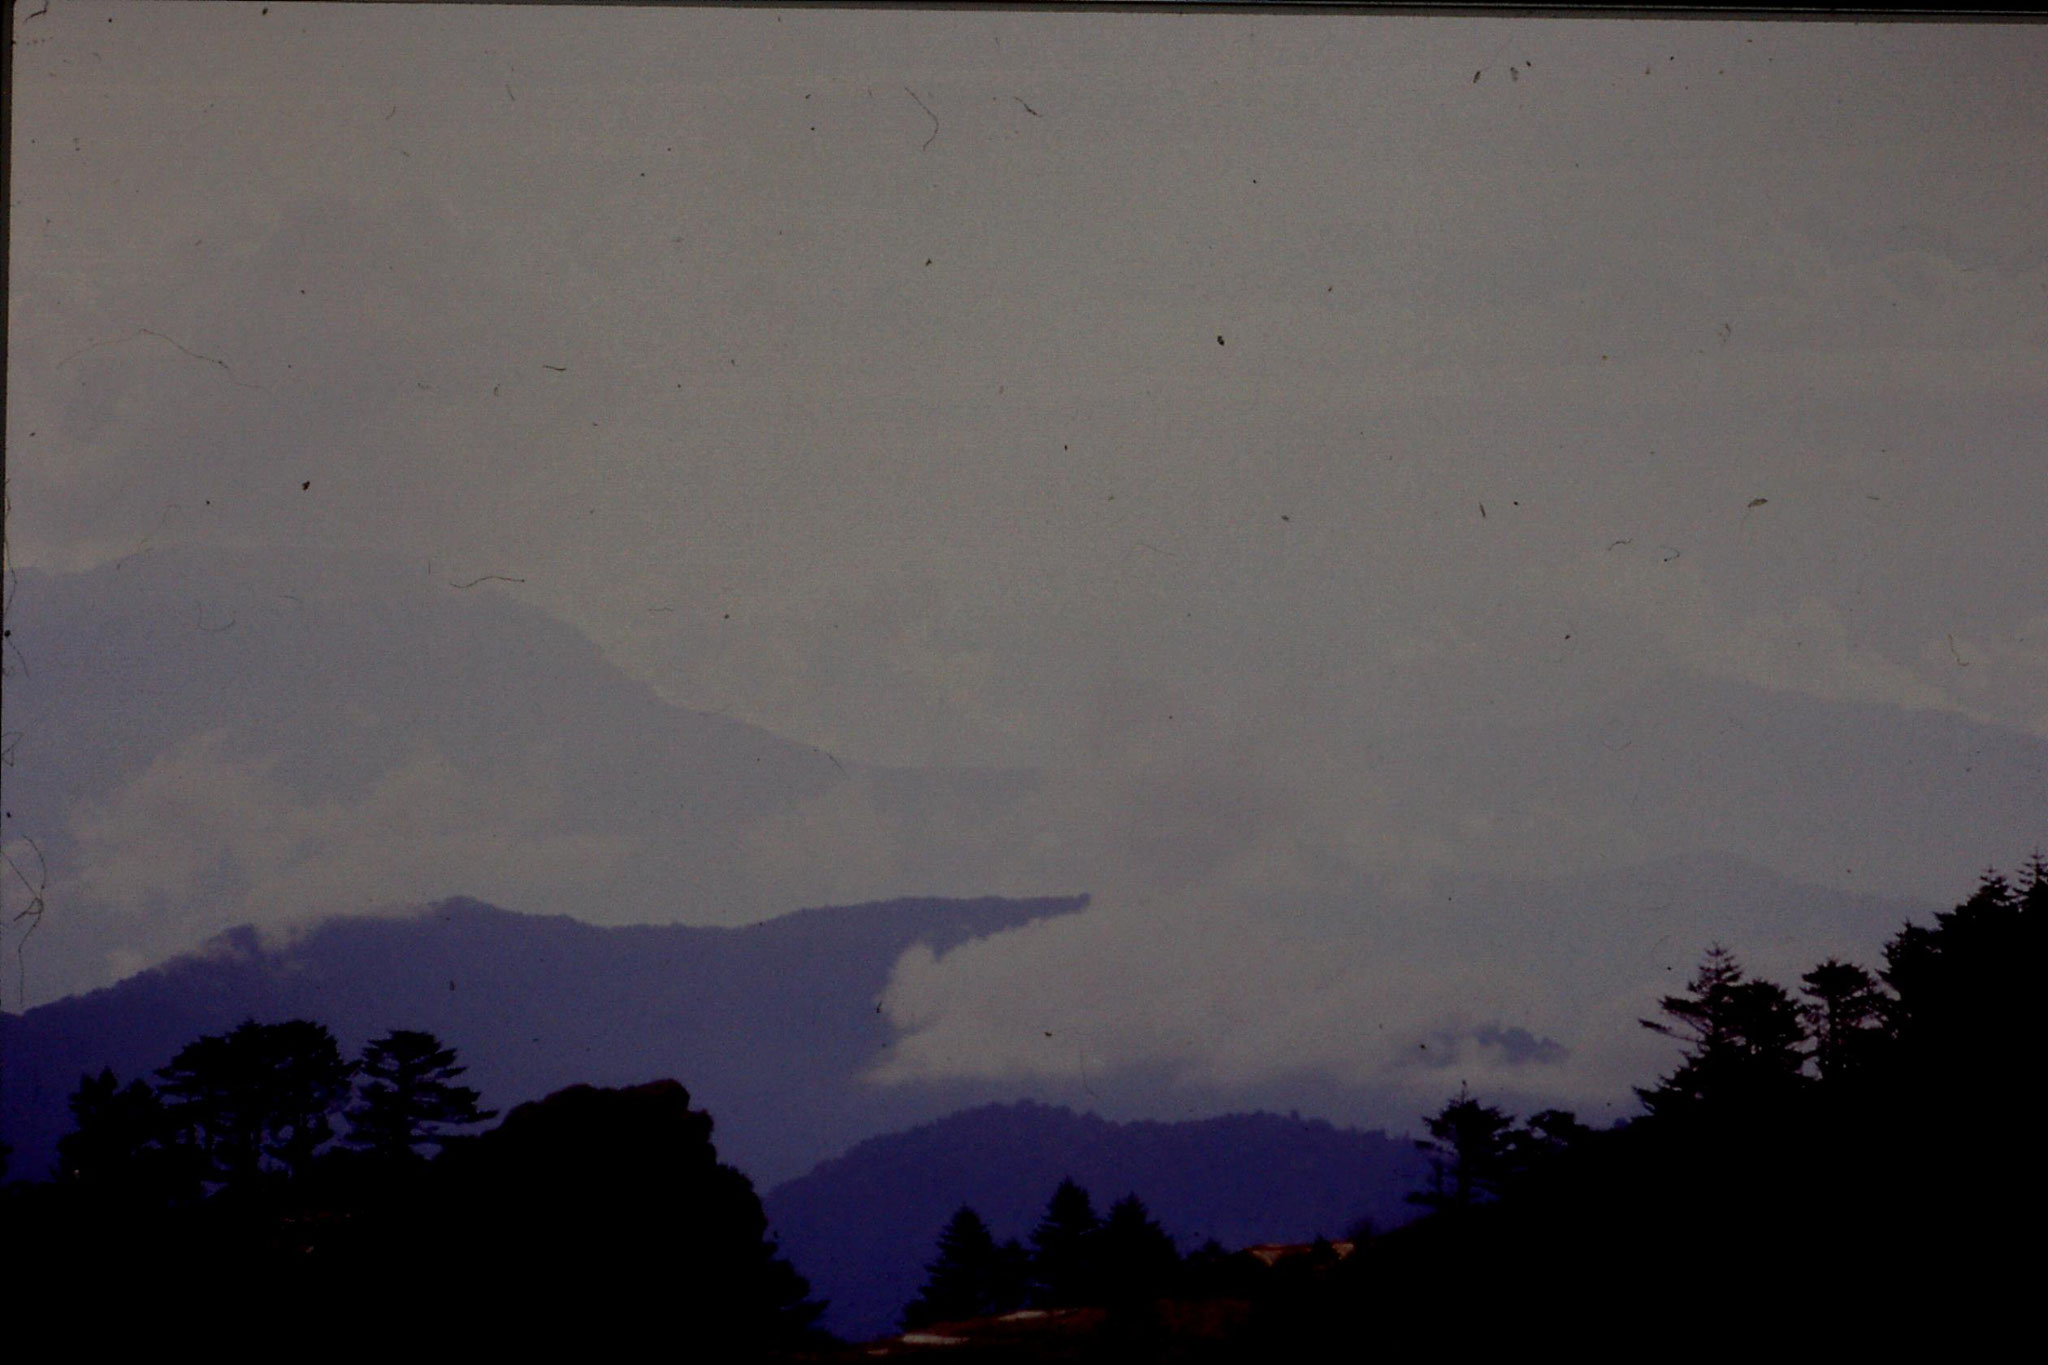 7/5/1990: 11: Sandakpu